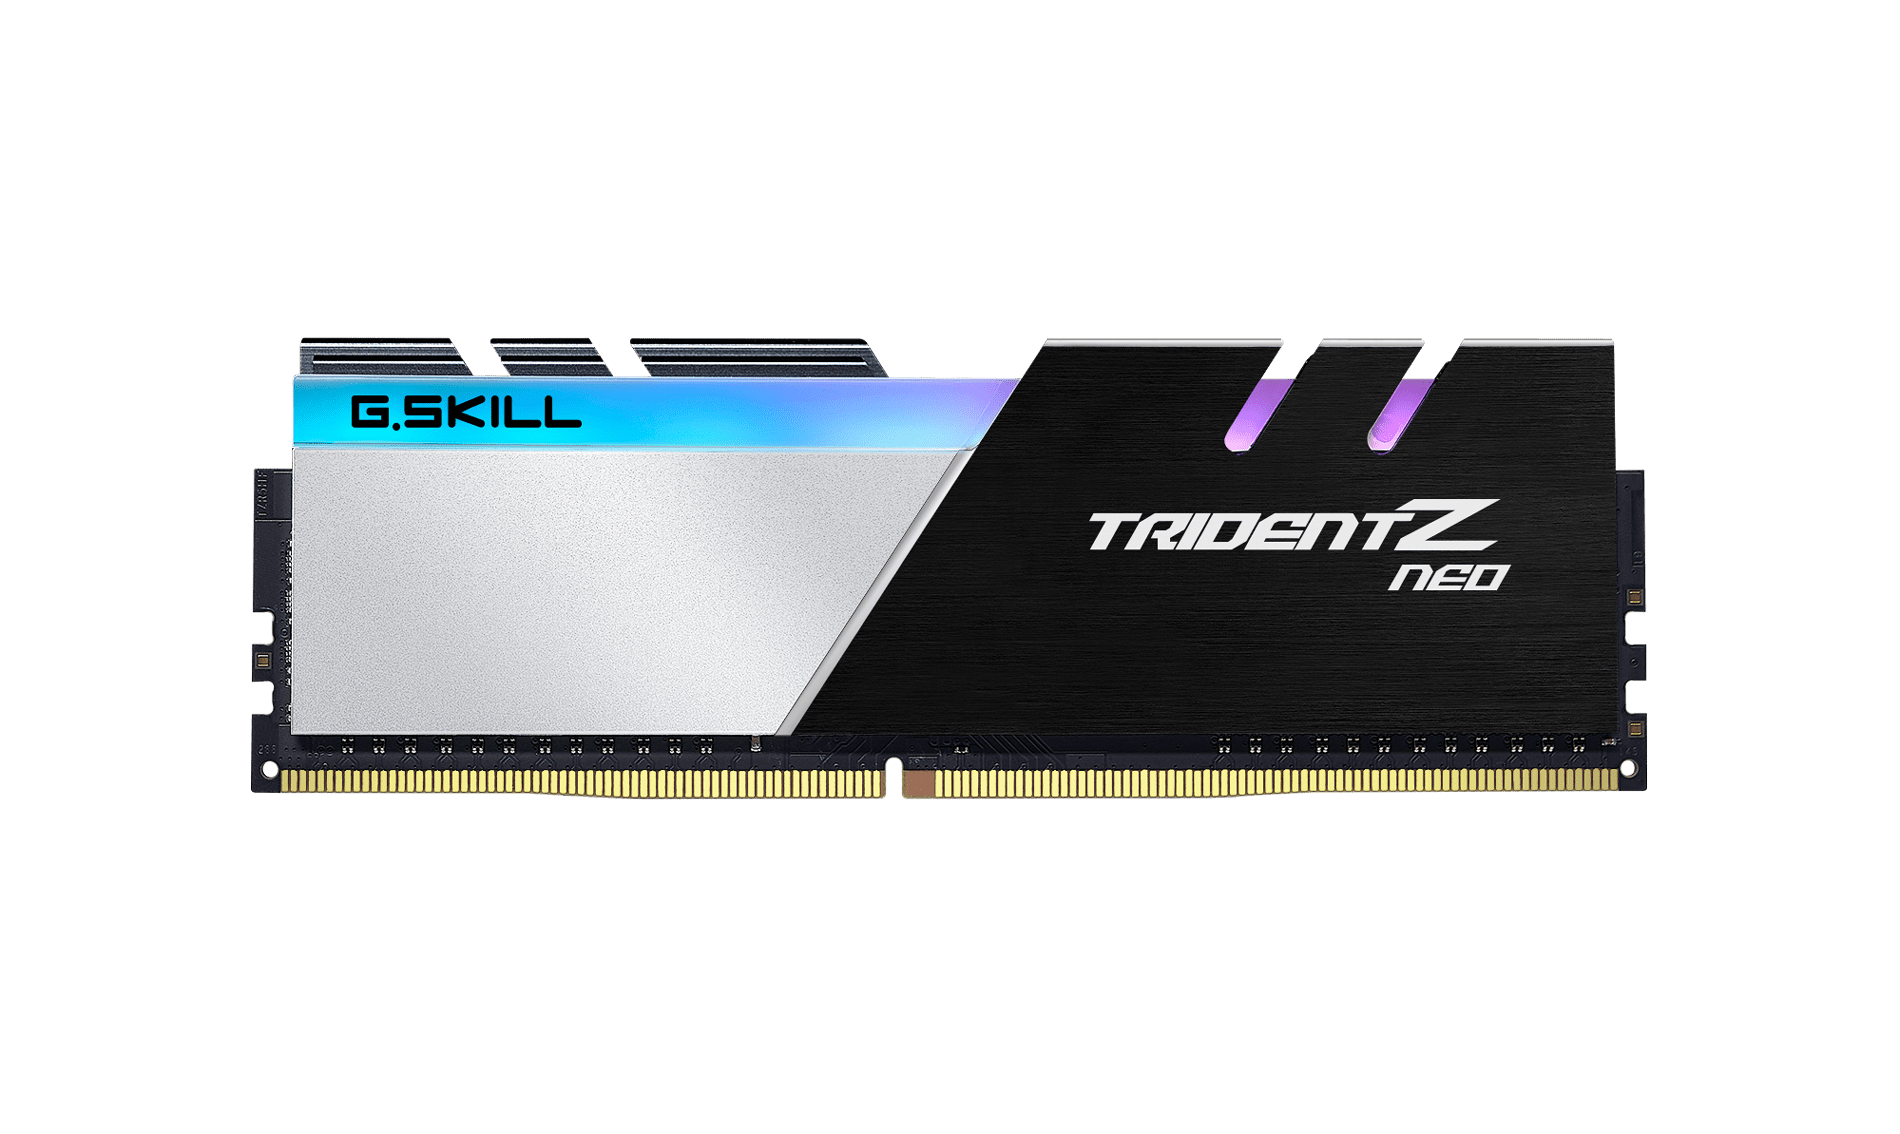 Памет G.SKILL Trident Z Neo RGB 32GB(2x16GB) DDR4 PC4-28800 3600MHz CL16 F4-3600C16D-32GTZN-3